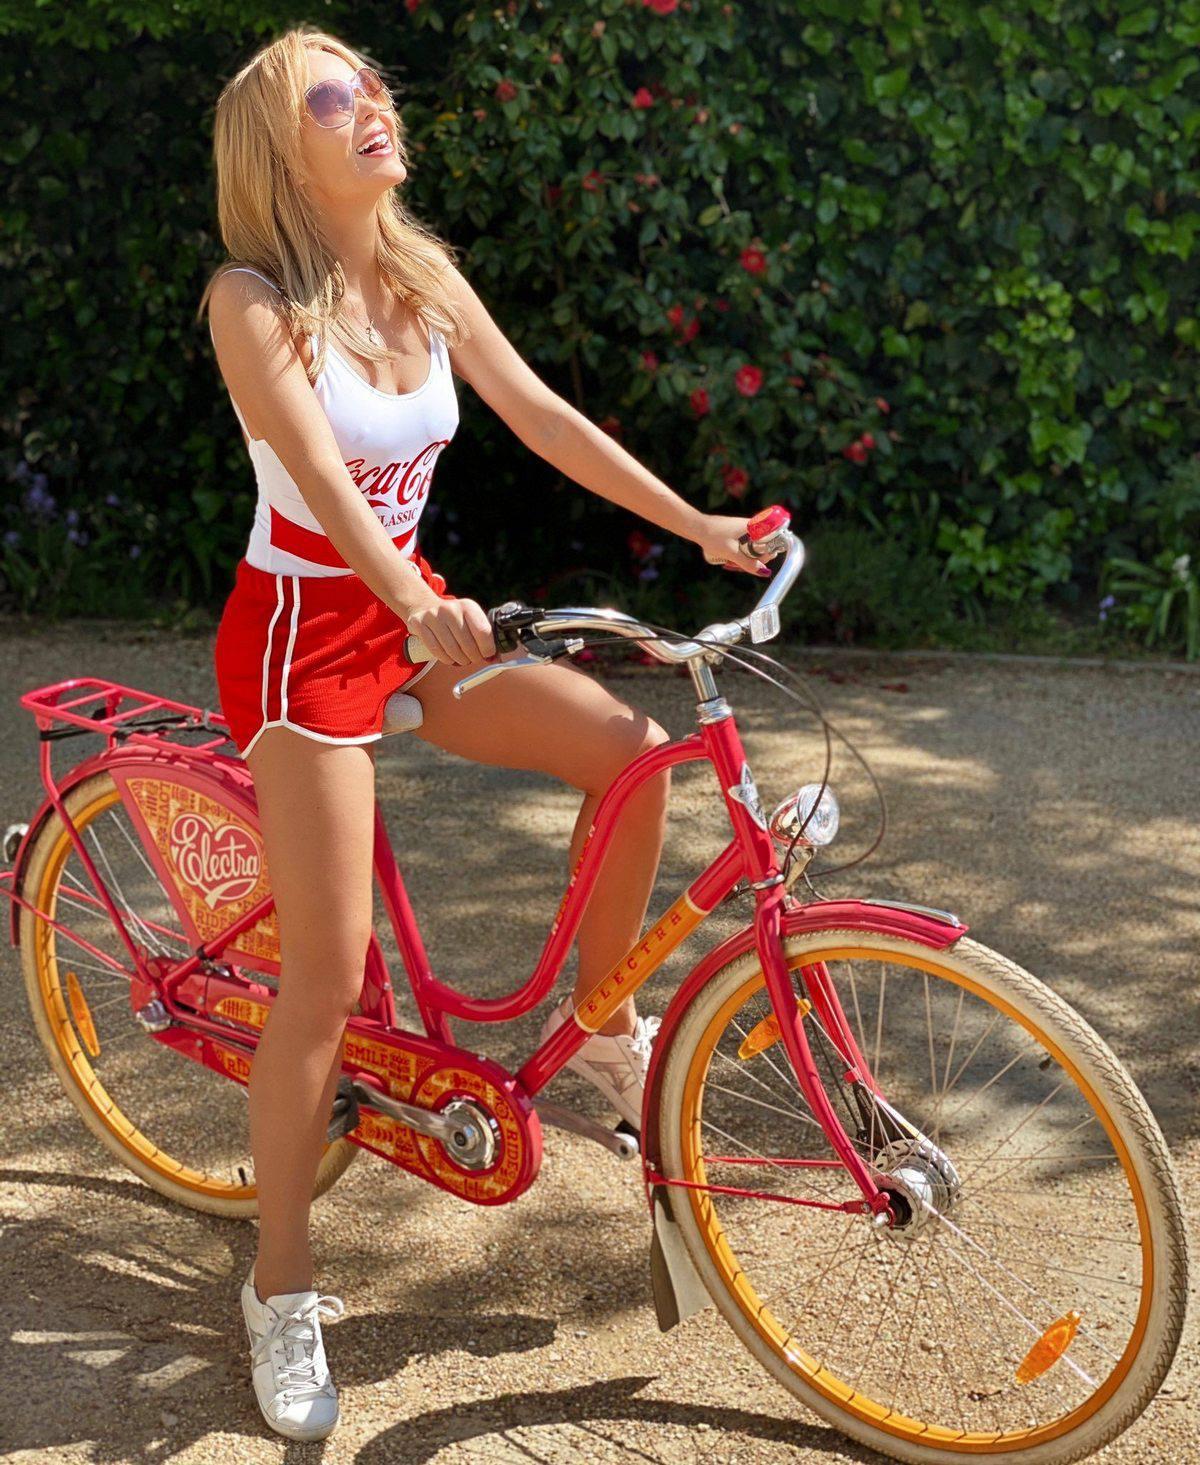 Amanda Holden Sexy Legs On Bike